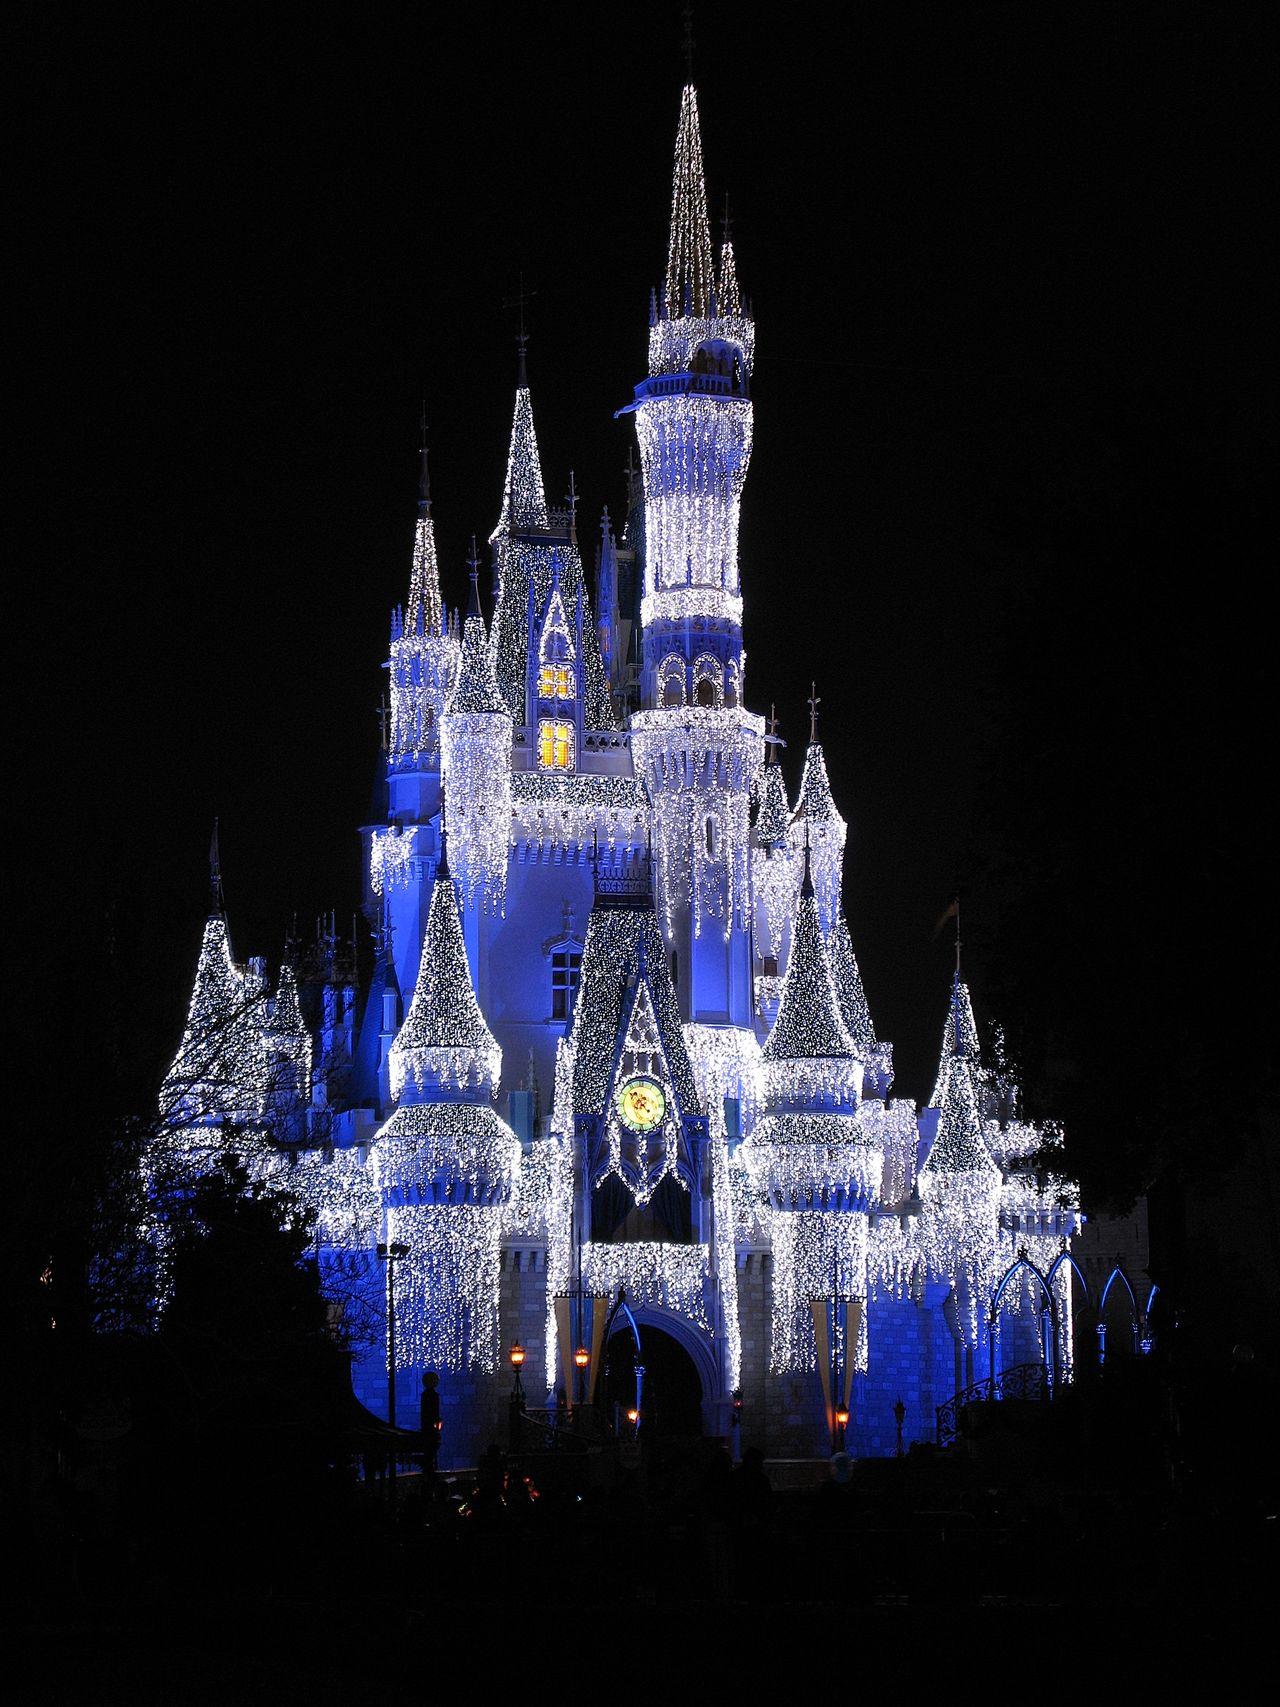 Walt Disney World The Magic Kingdom Orlando Orlando Florida Florida Cinderella Castle Christmas Time Christmas Christmas Lights Castle